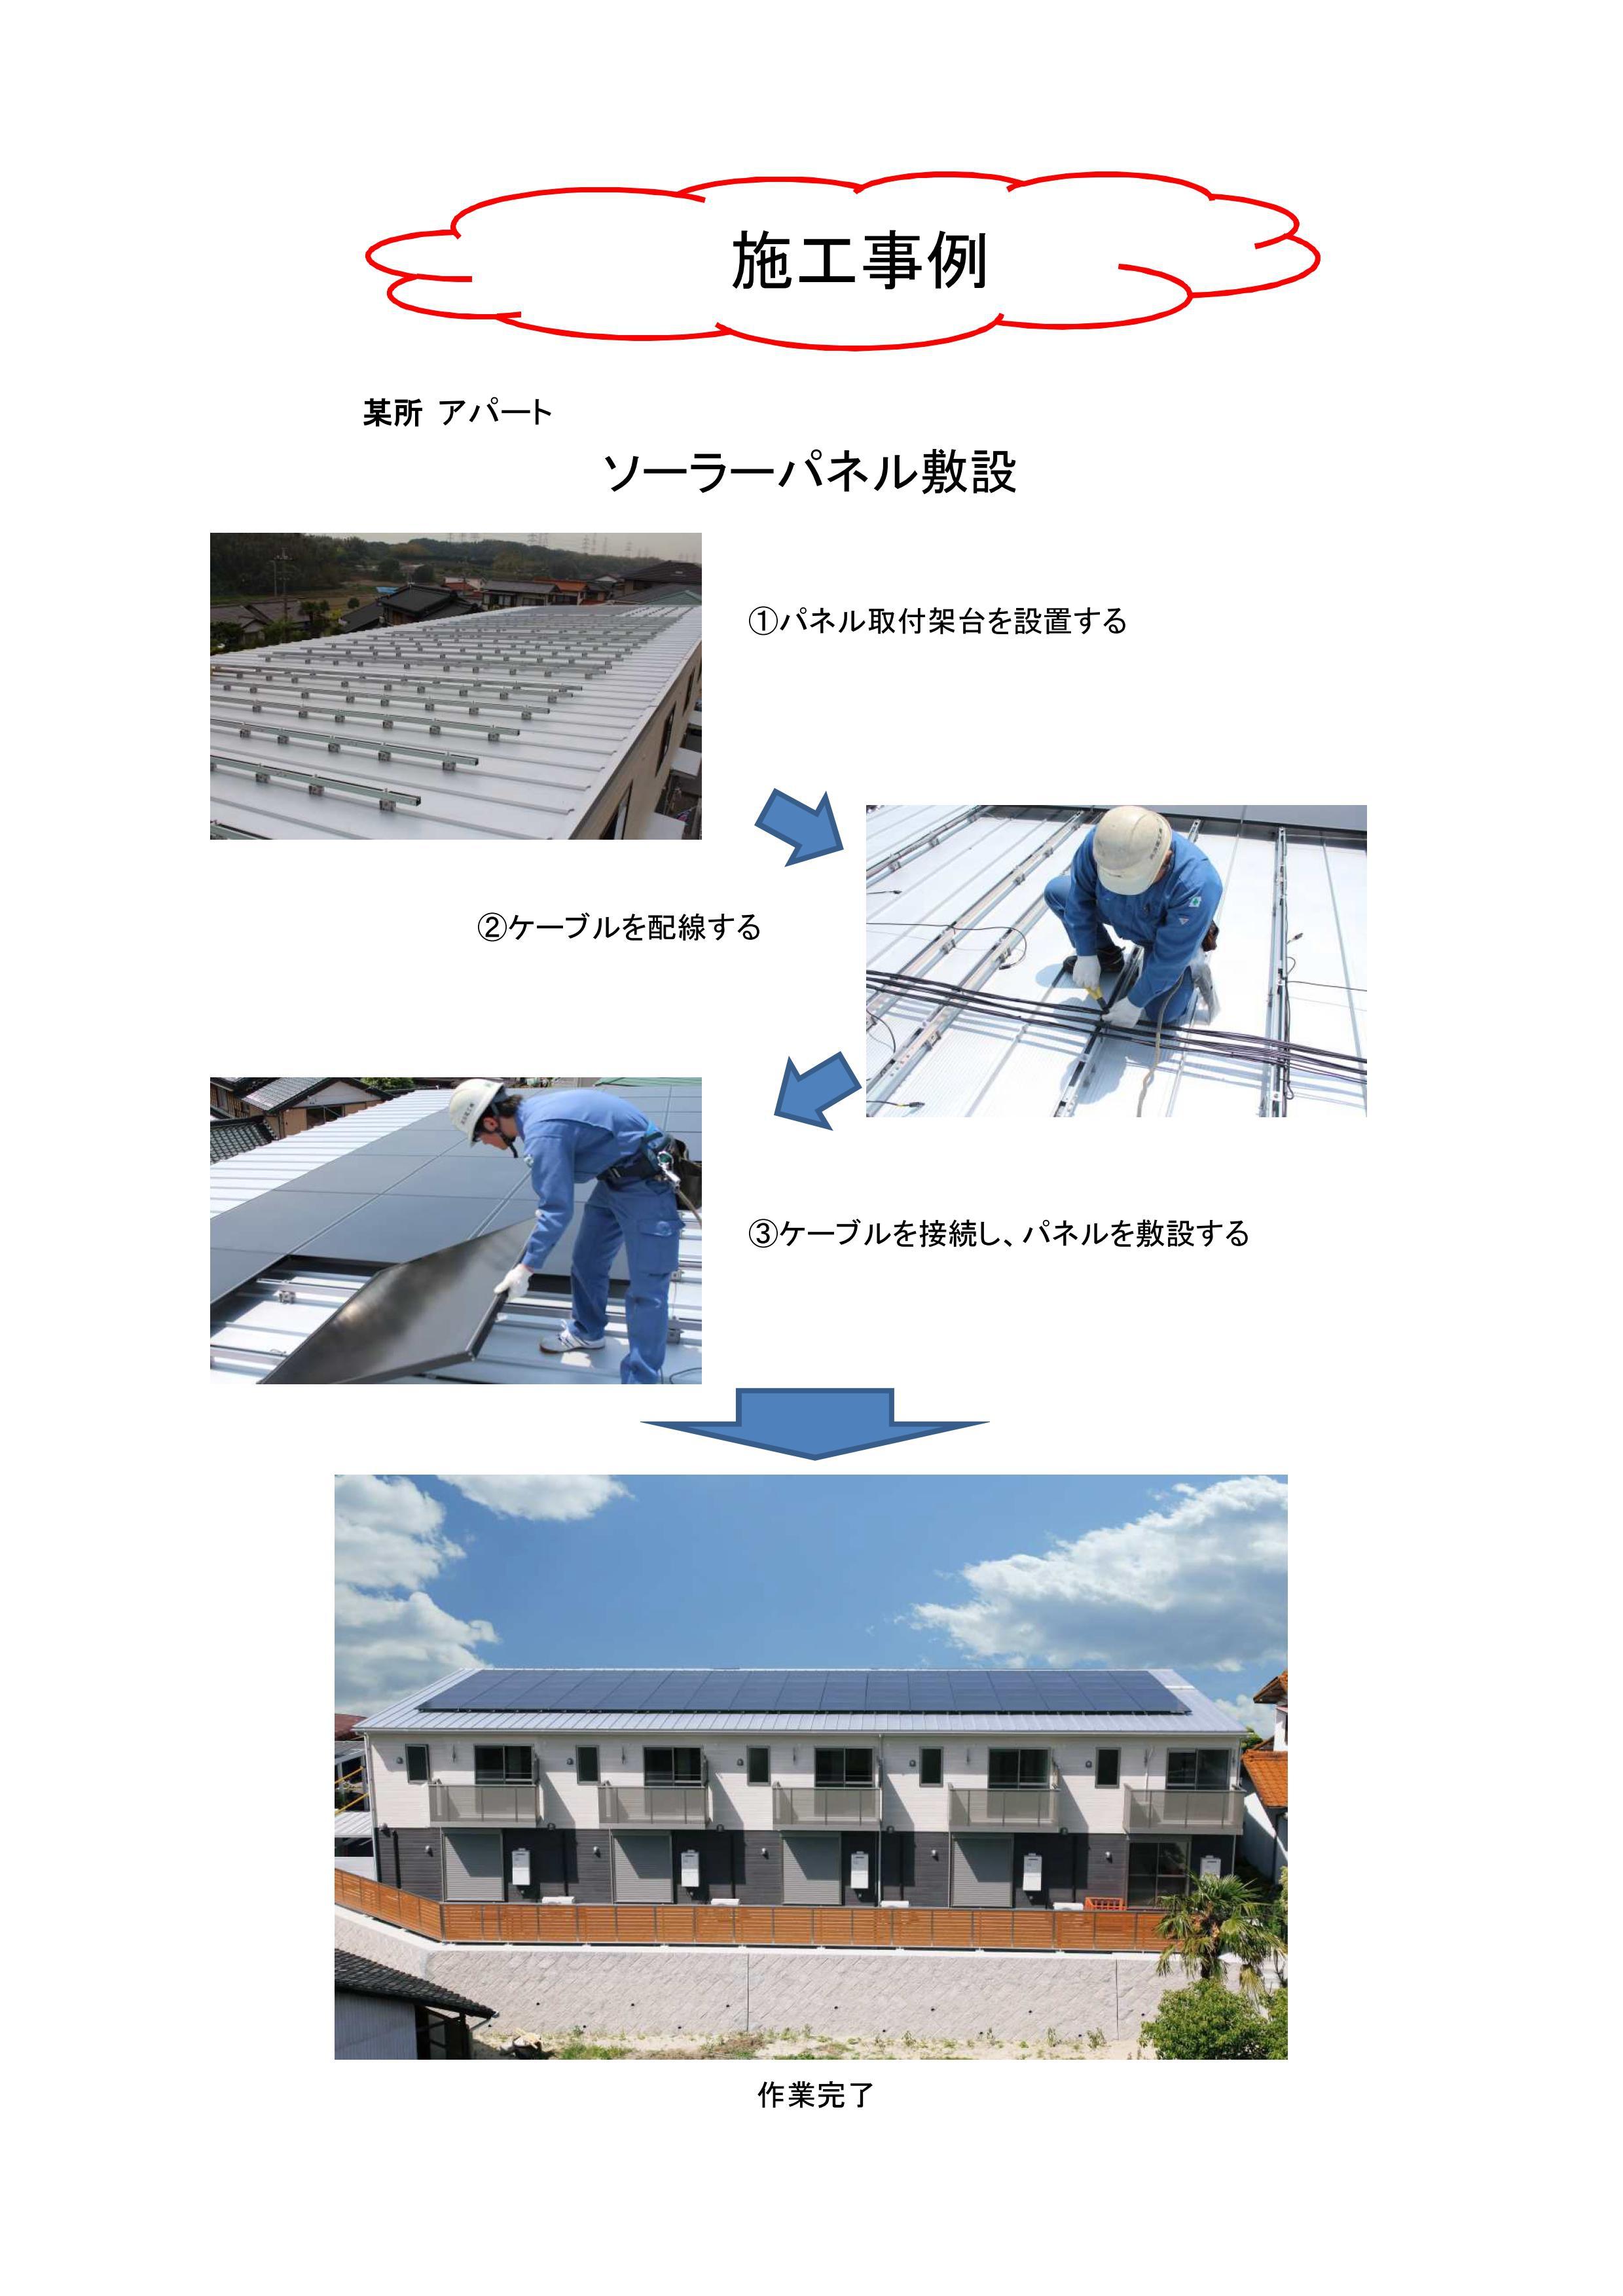 工事実績 2013.5 某所アパート 太陽光発電設備工事